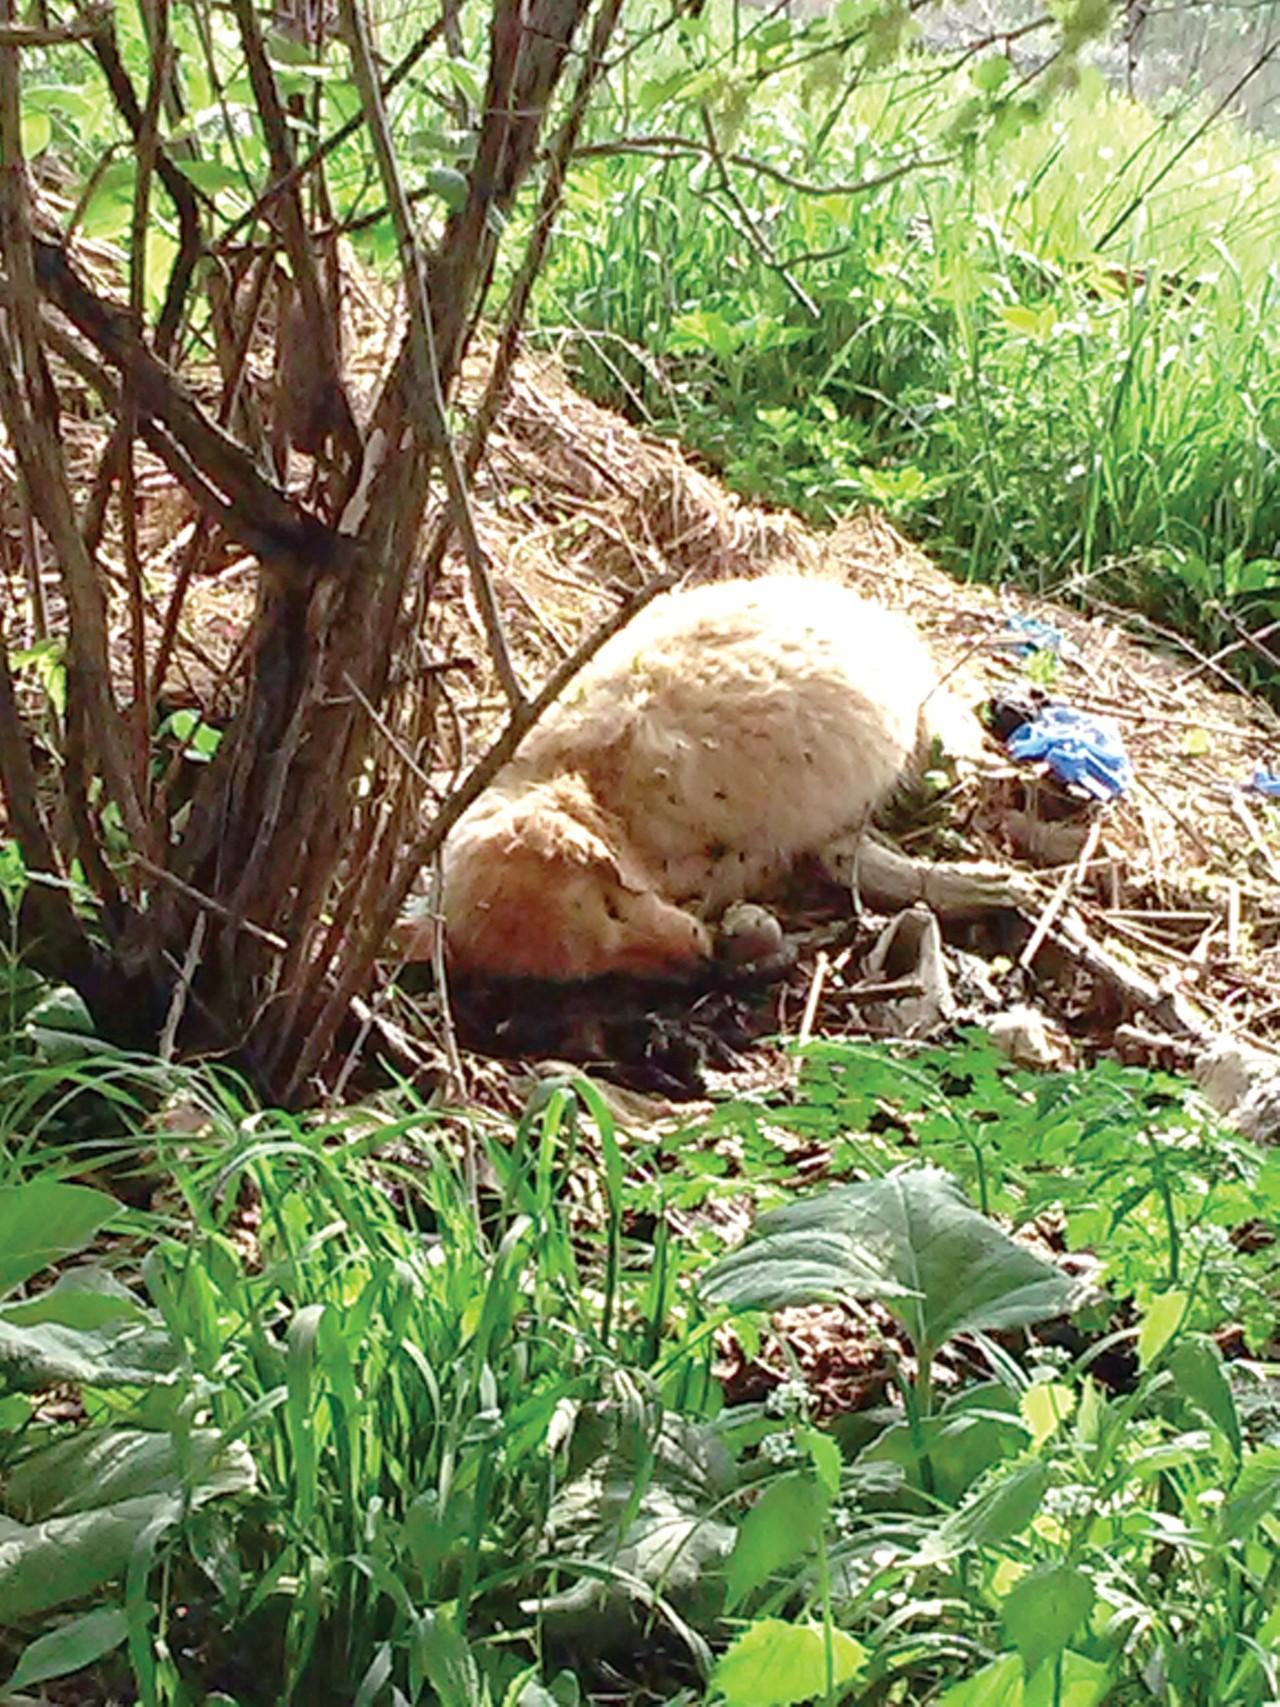 ohio u0027s dog breeding regulations aren u0027t solving the puppy mill